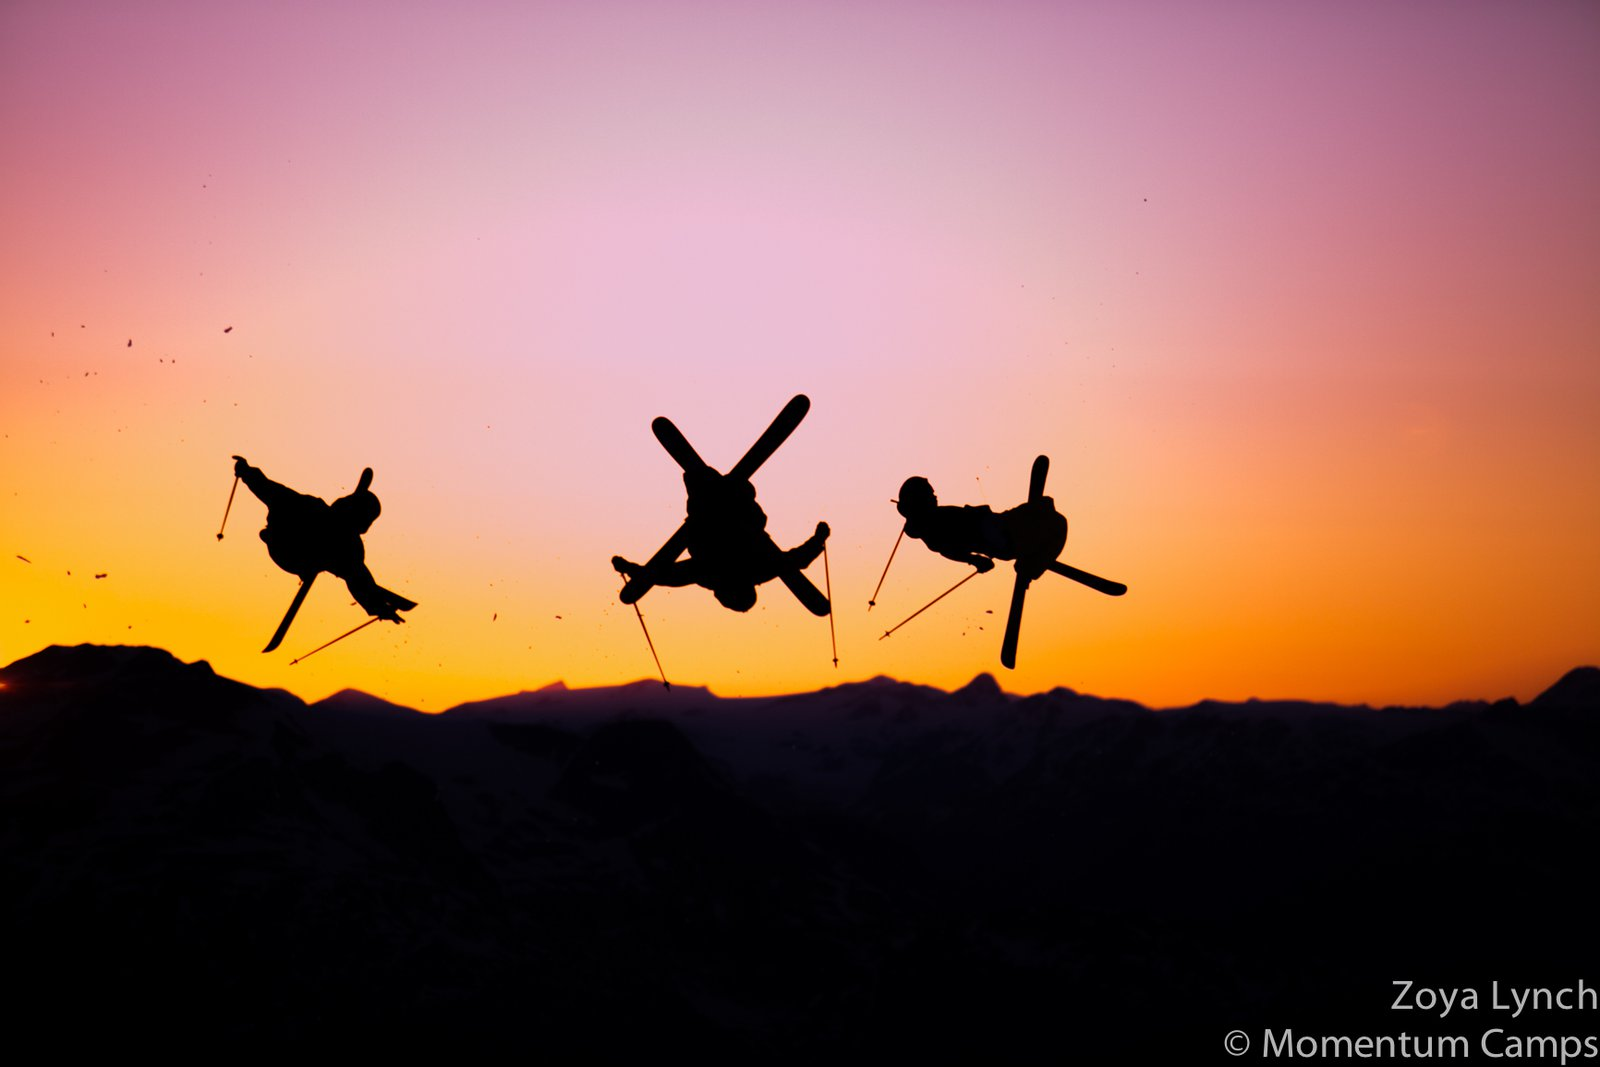 Friends in the sky :)